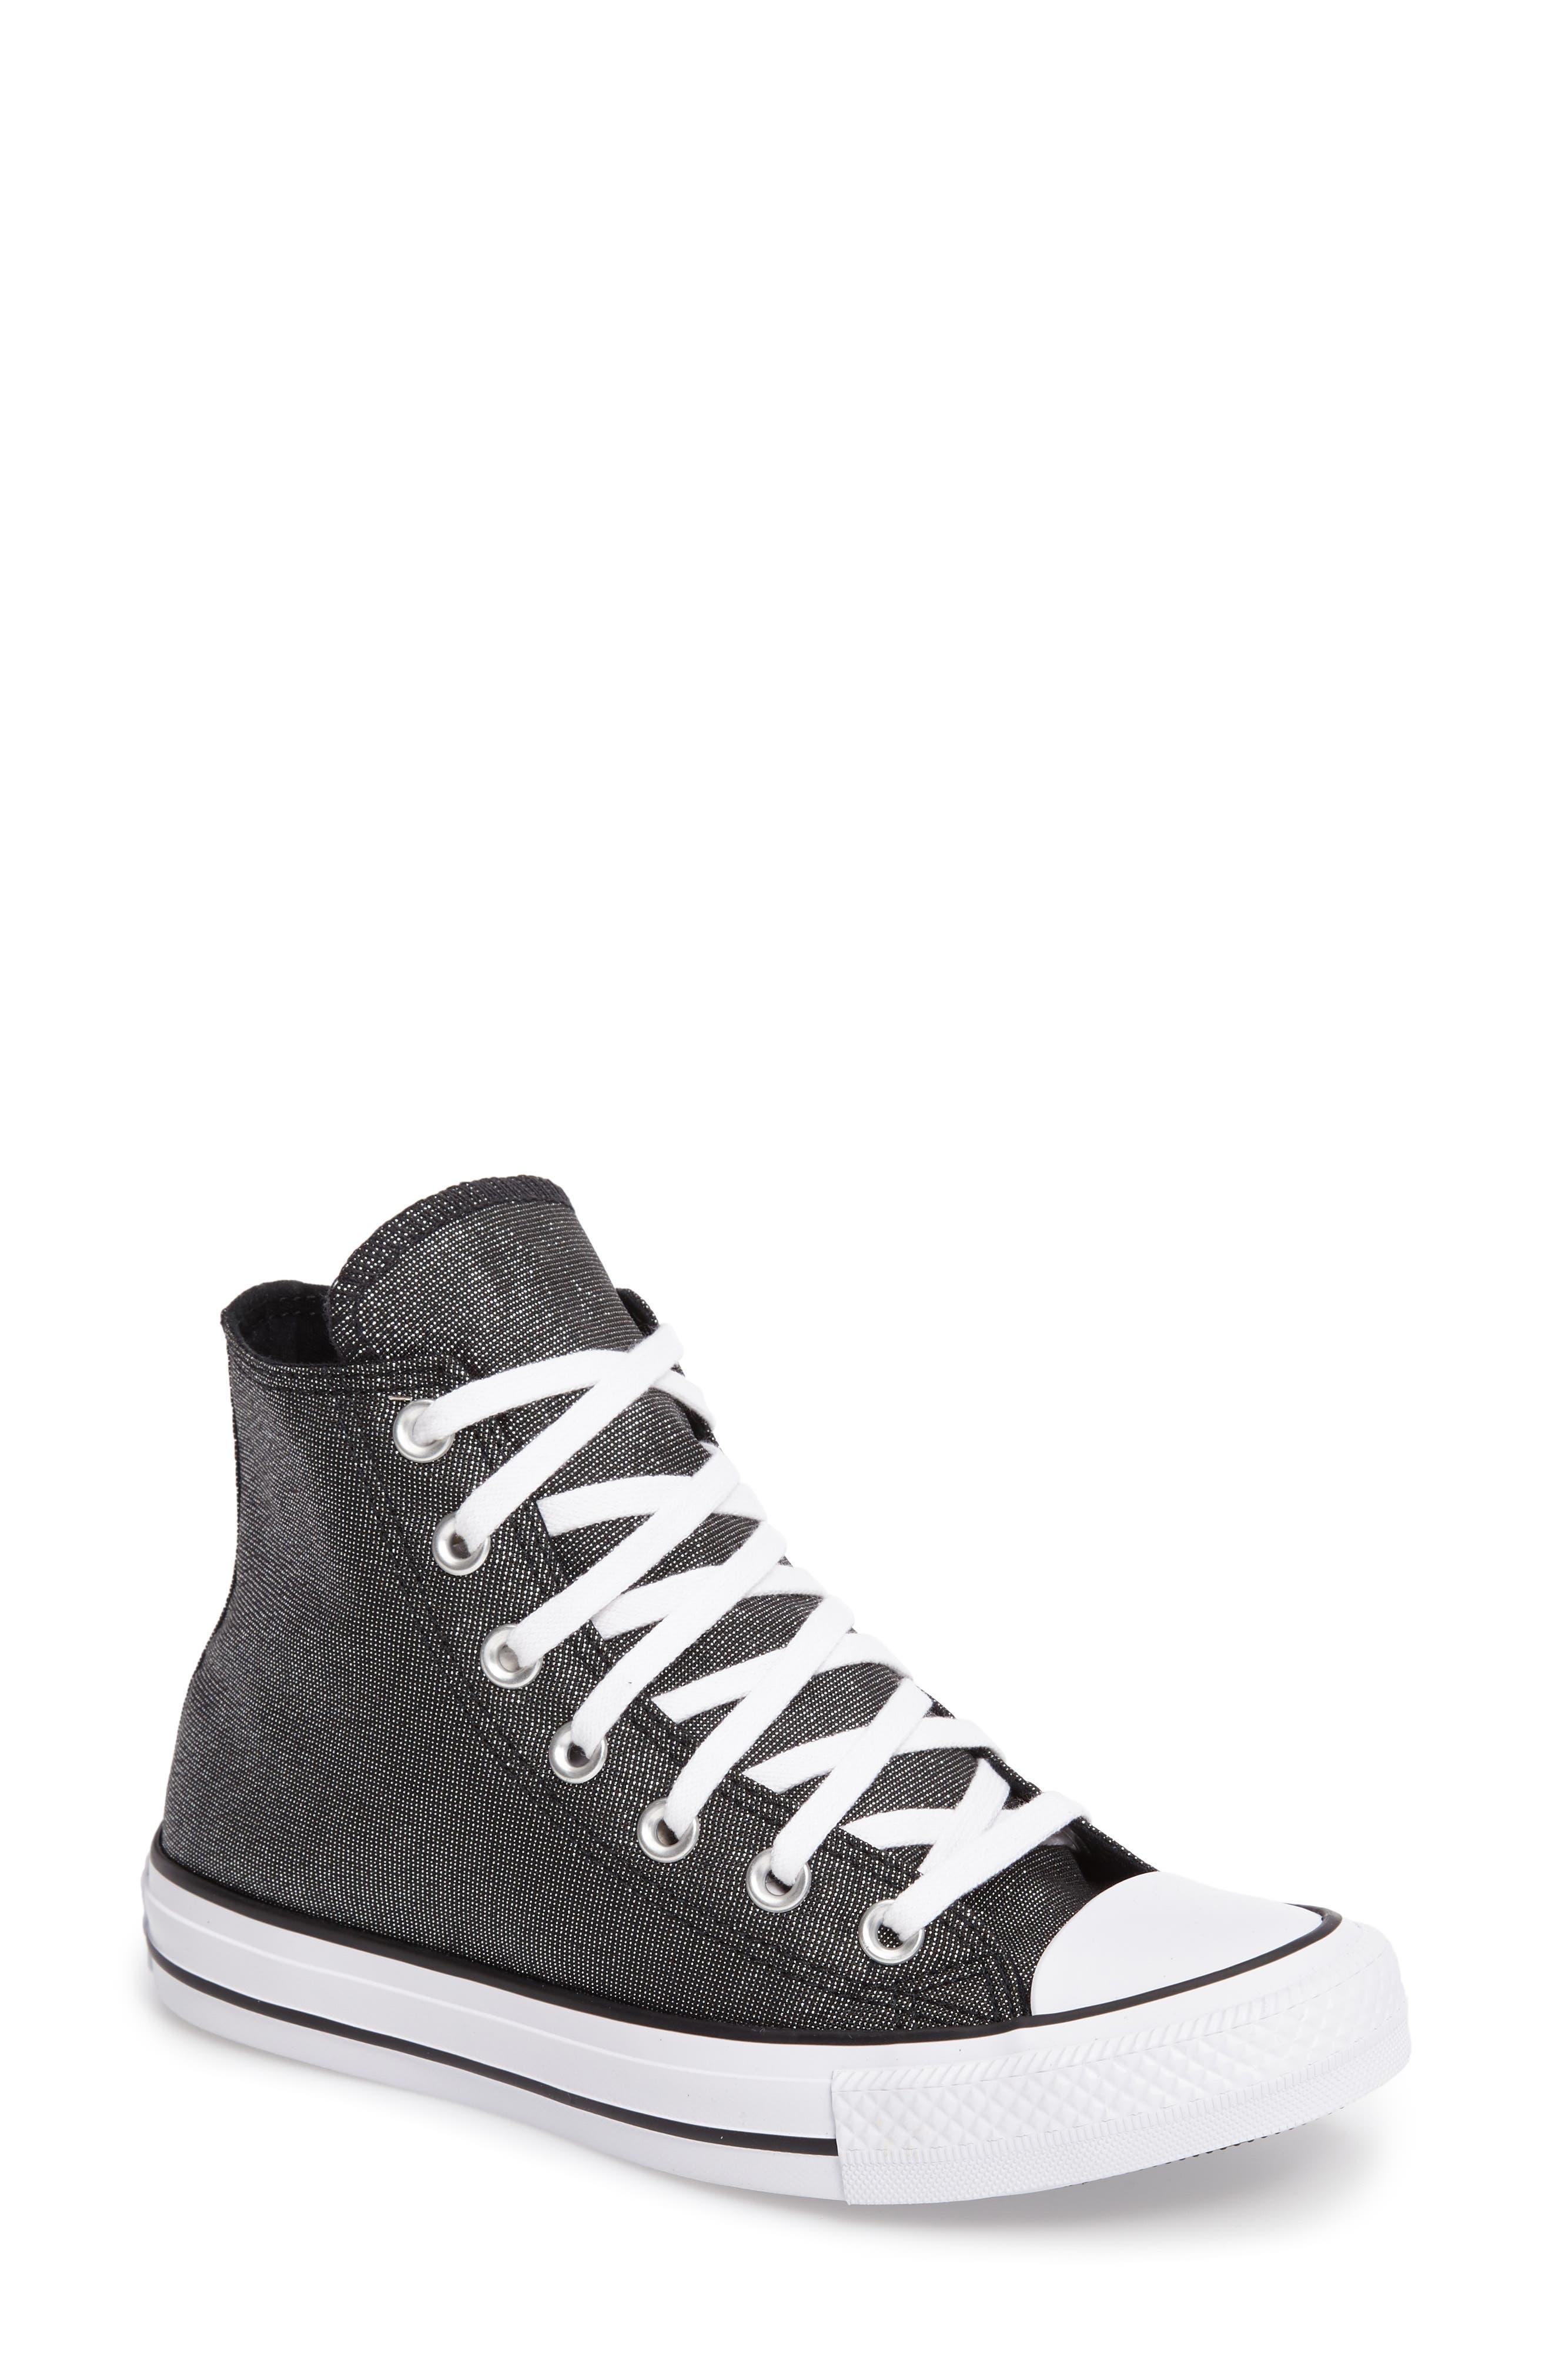 Main Image - Converse Chuck Taylor® All Star® Glam Hi Sneaker